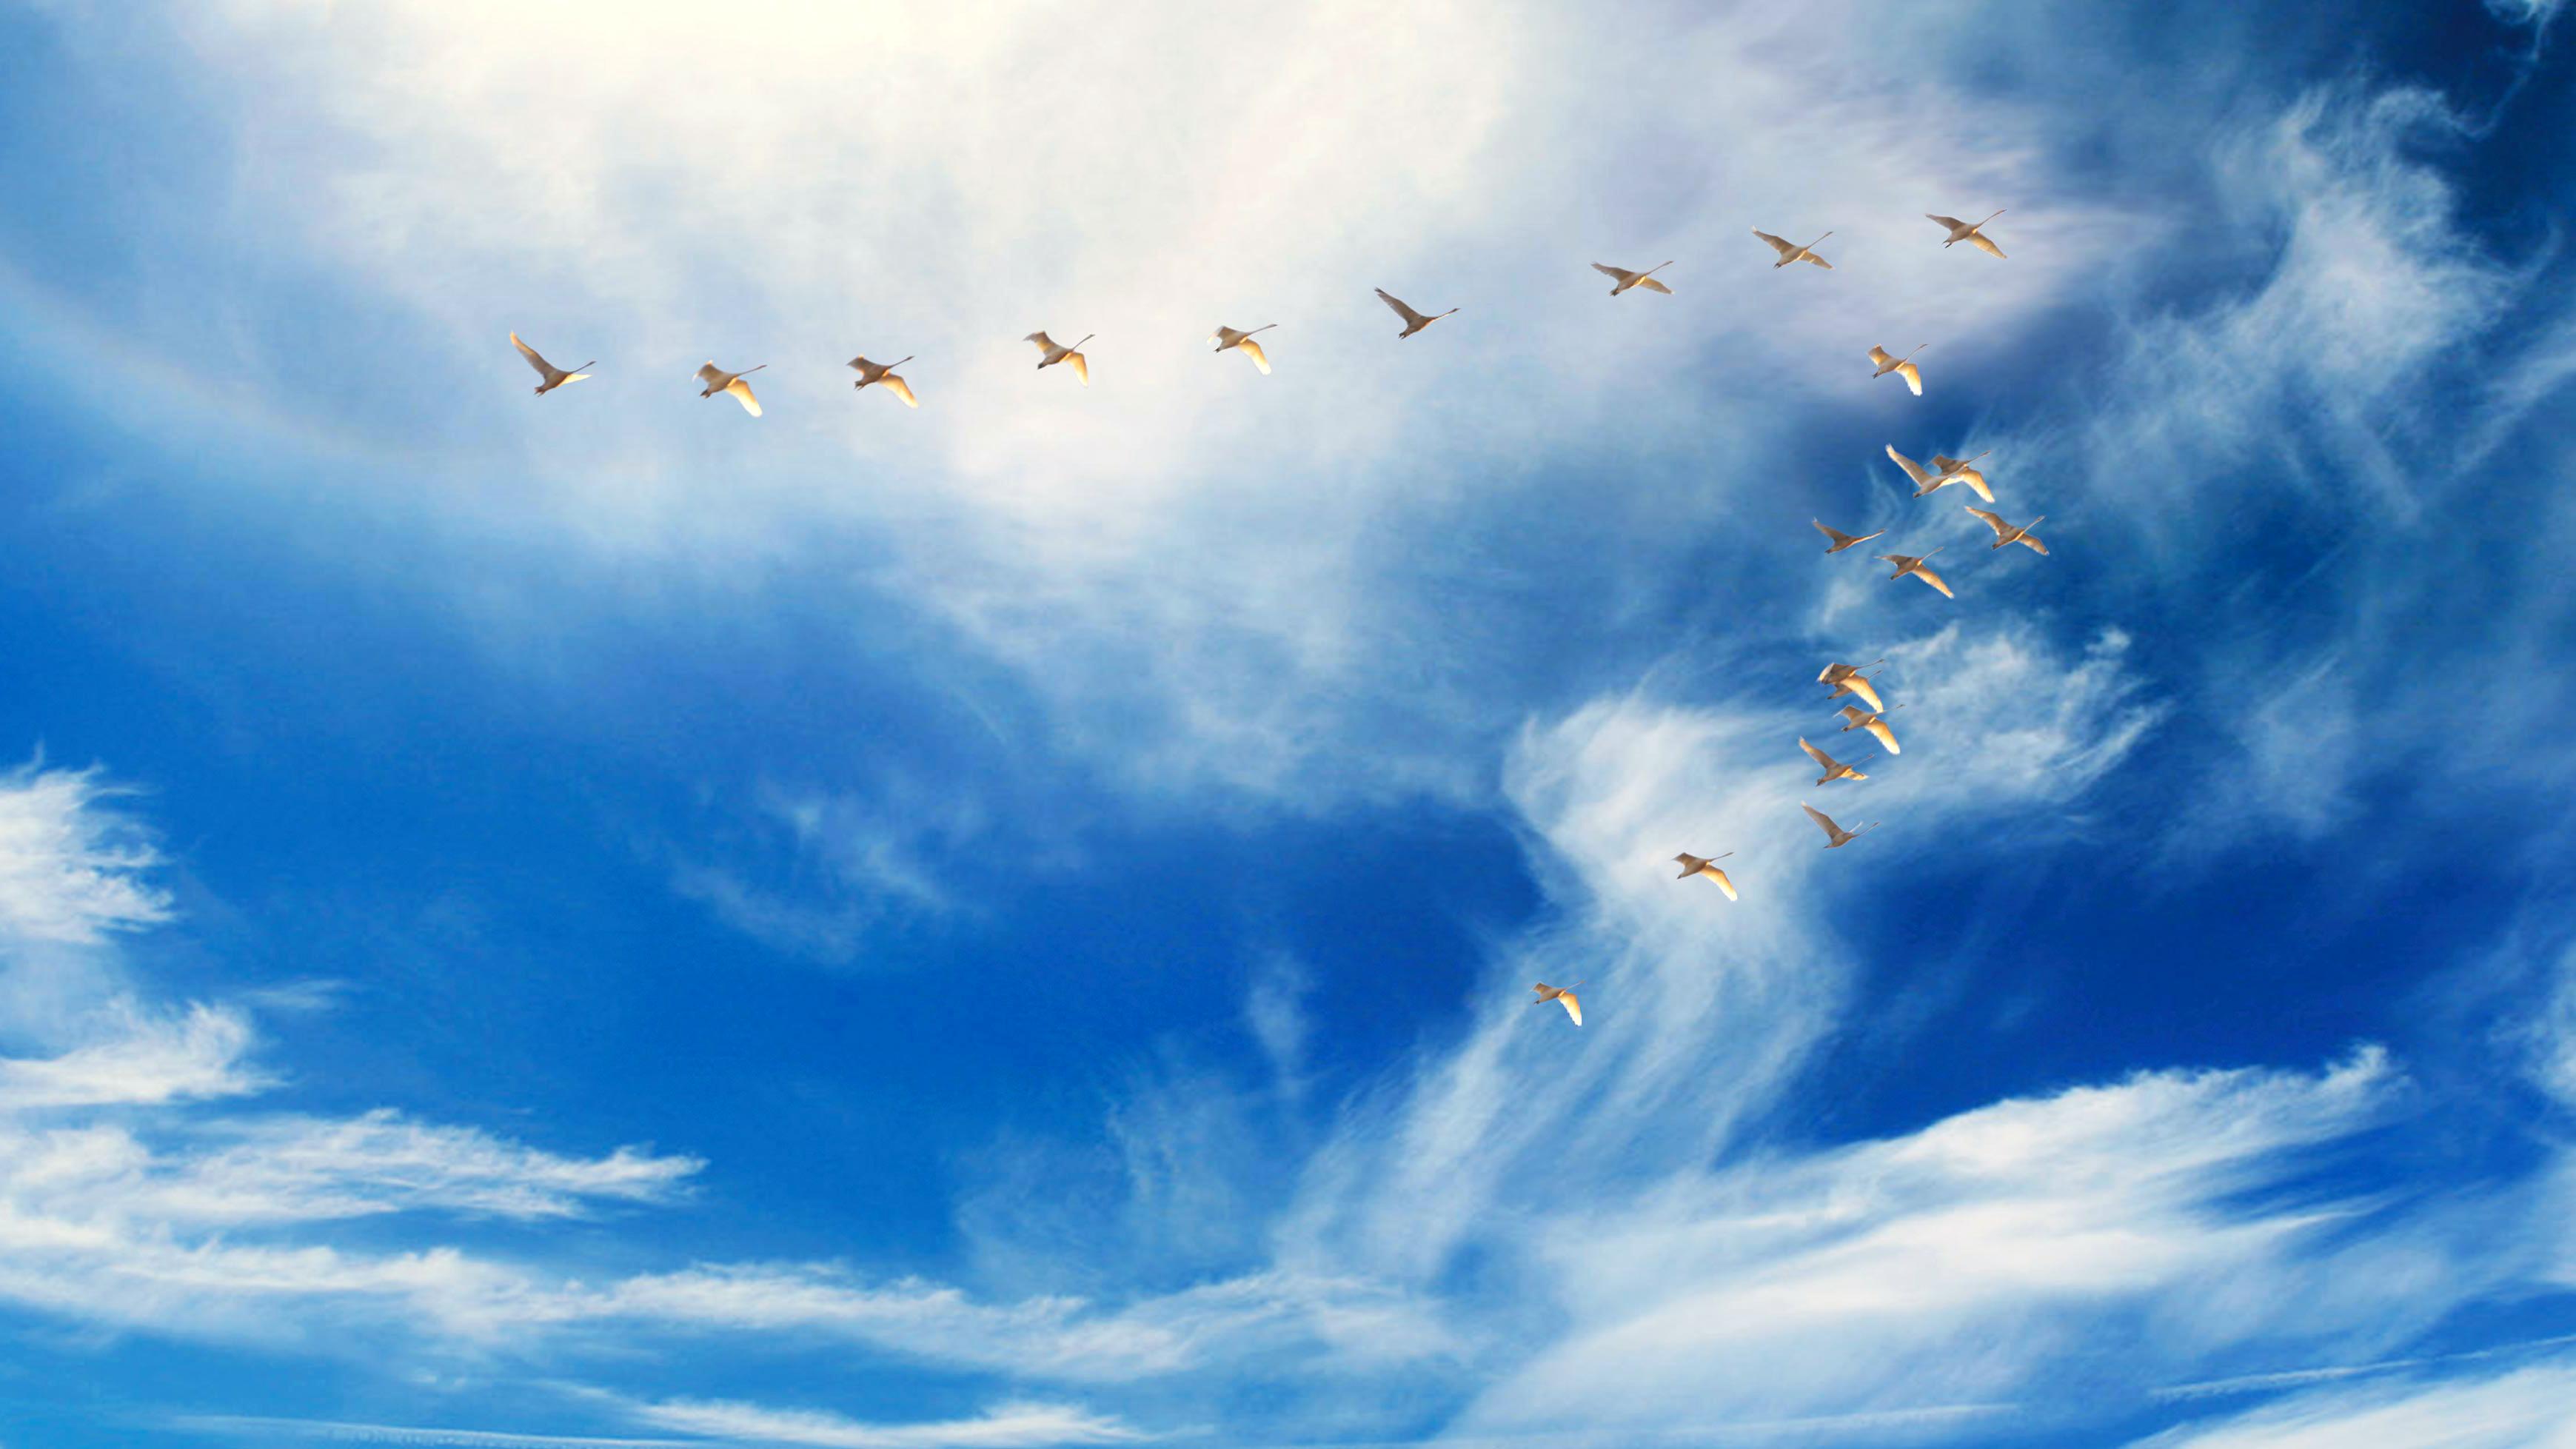 Wallpapers Hd Flying Birds Apple Animals Blue Sky Desktop: Birds Flying In Formation HD Wallpaper